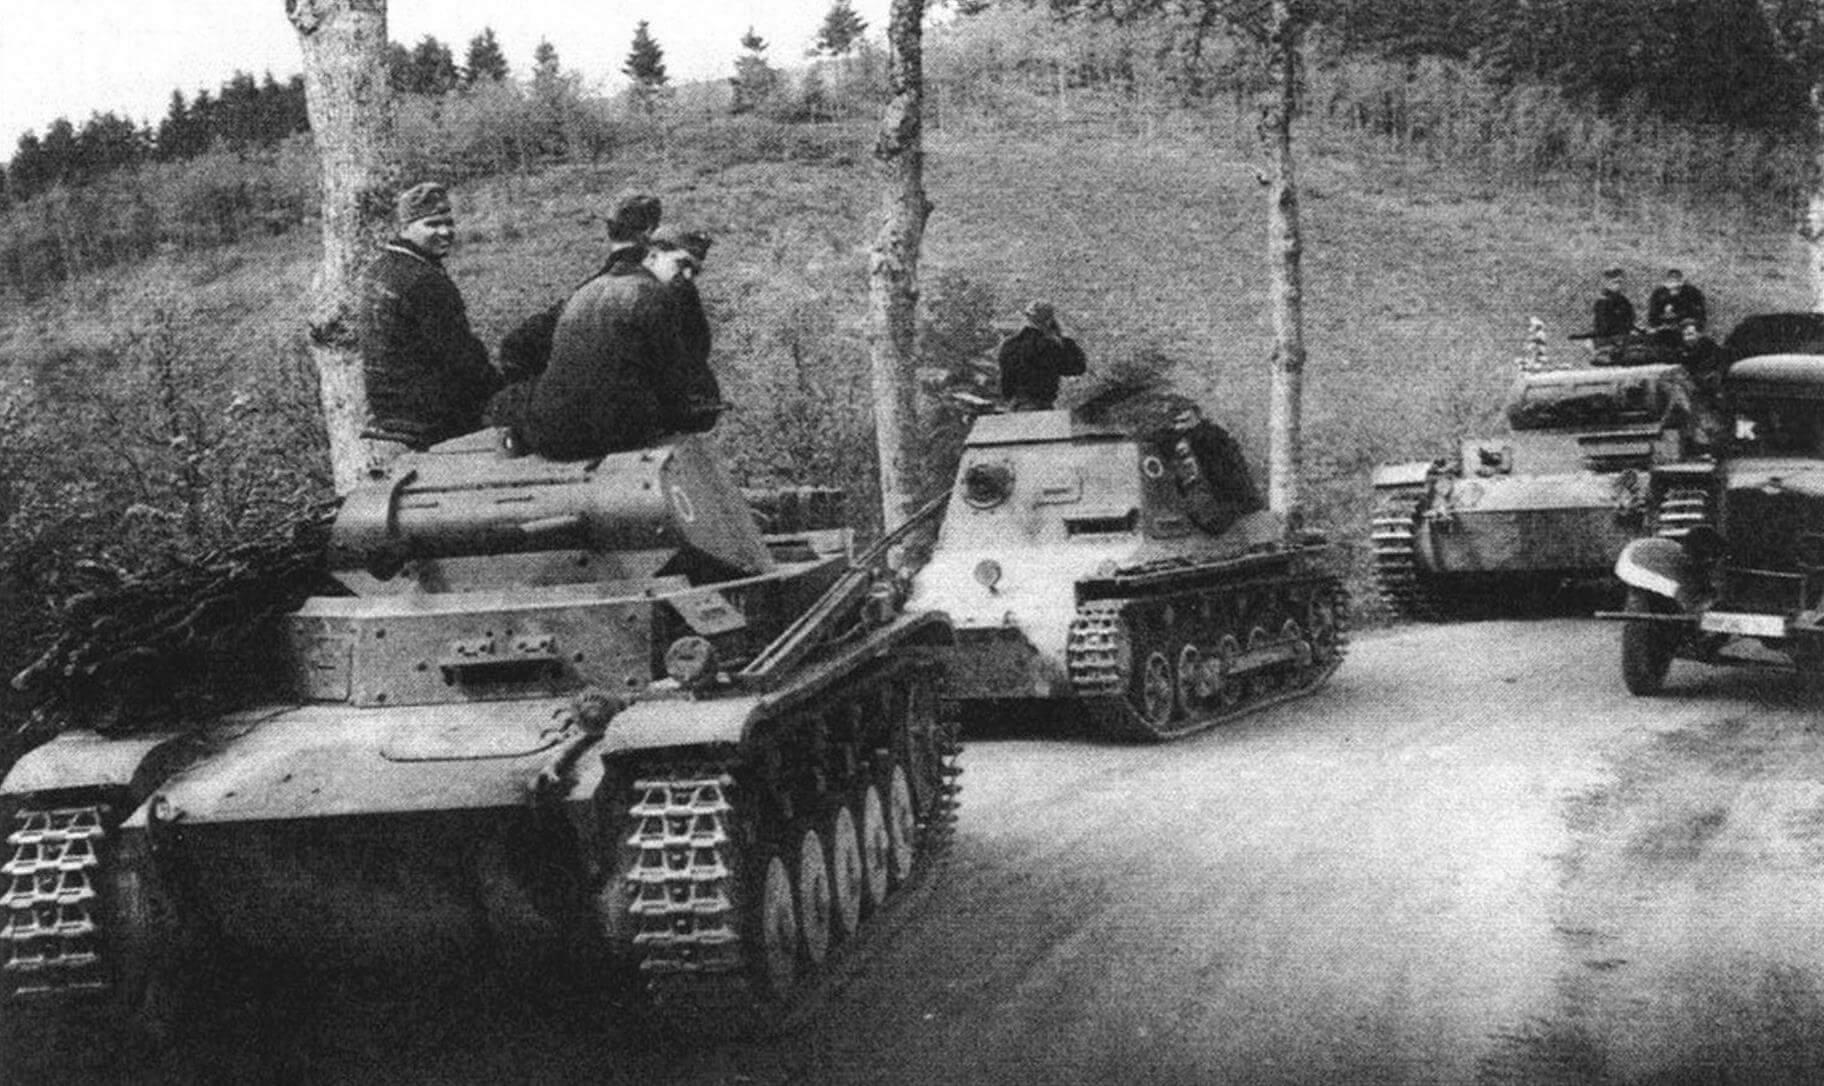 Колонна немецких танков в Арденнах. Май 1940 года. На переднем плане Pz.II